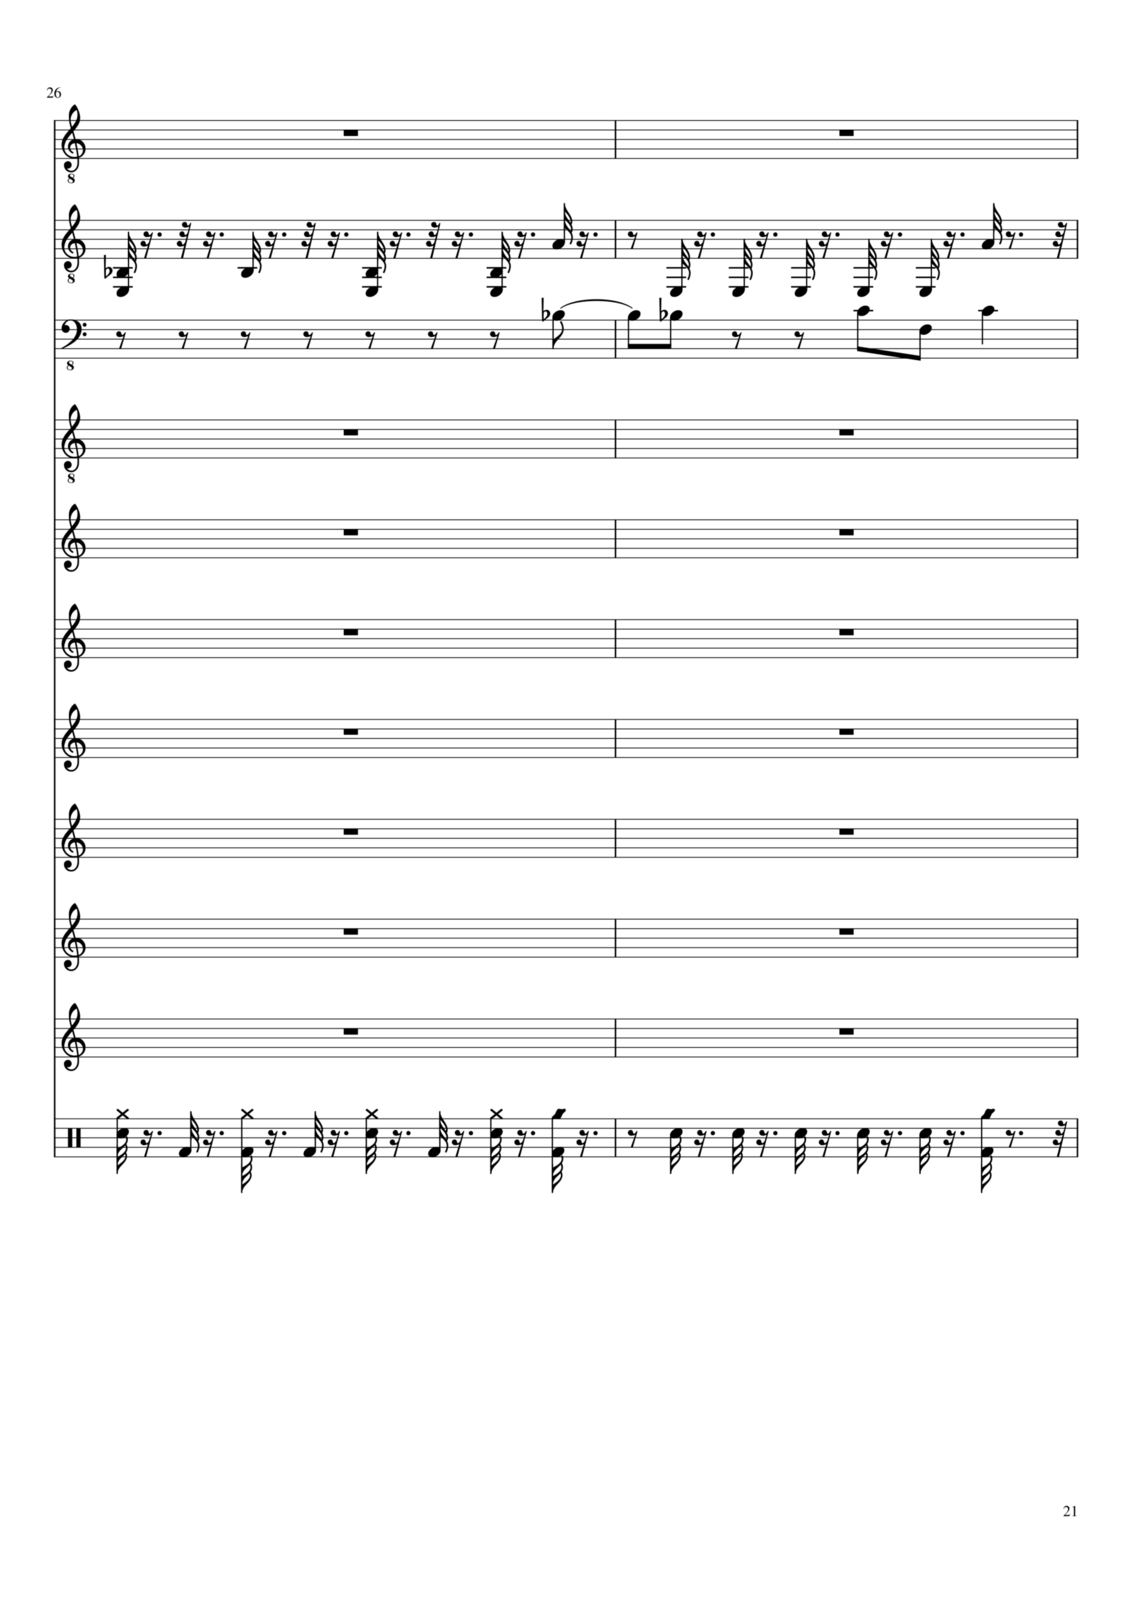 Belyiy sokol slide, Image 21